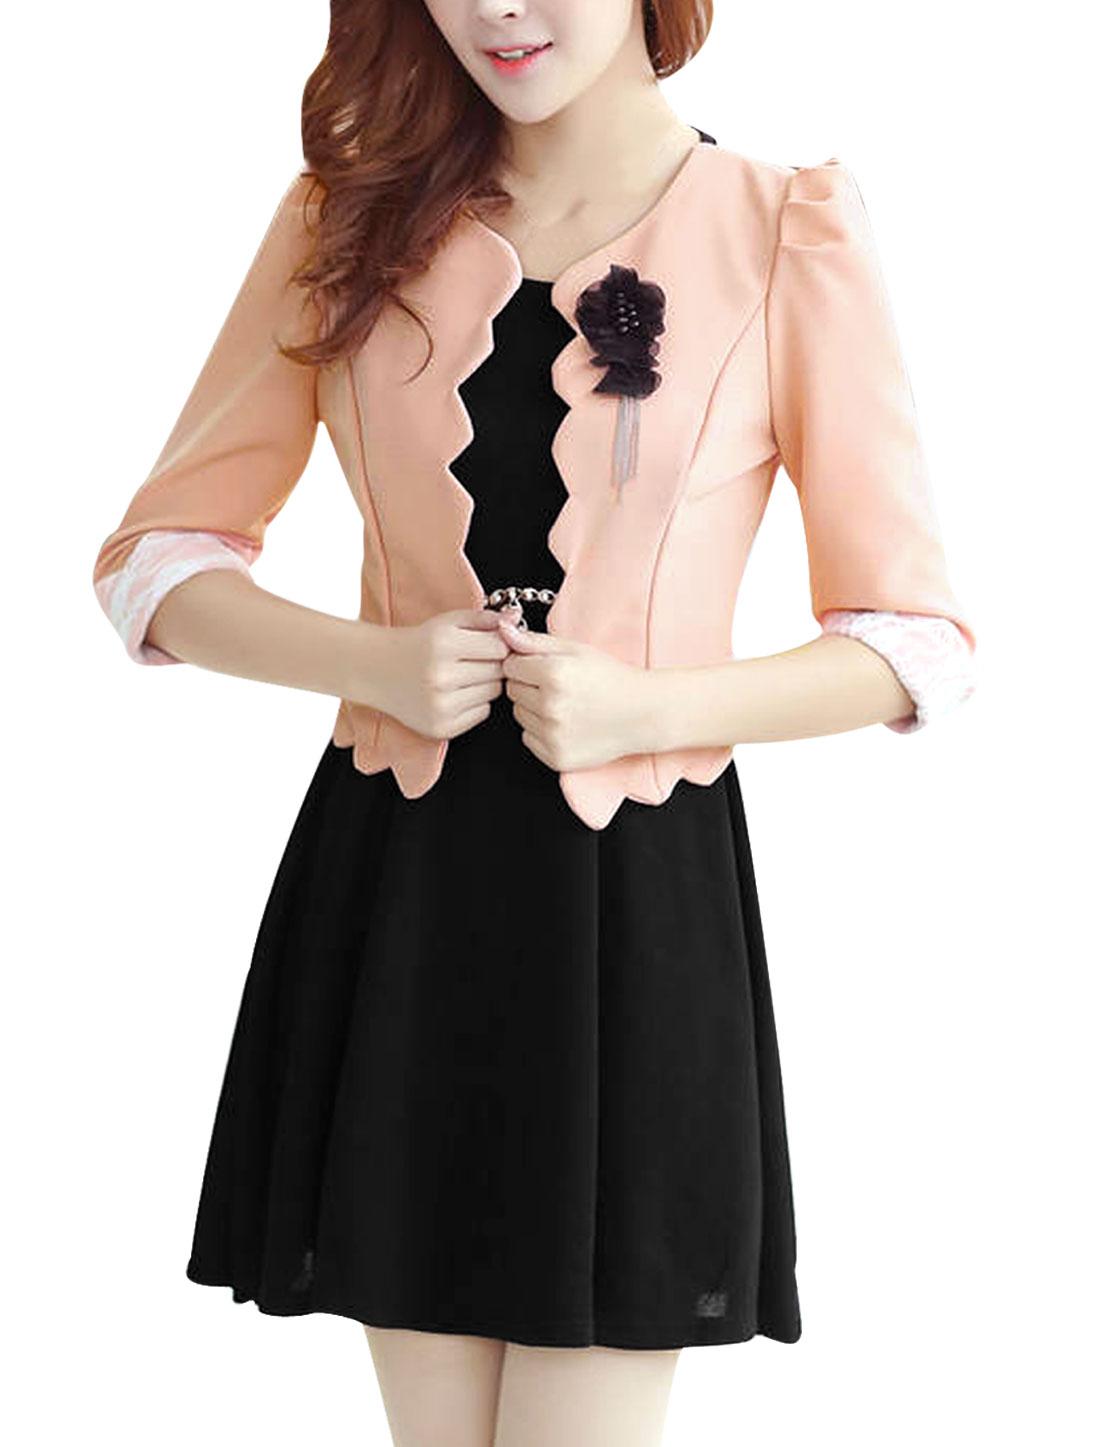 Lady Round Neck Sleeveless Dress & Front Open Pink Black Cropped Jacket XS